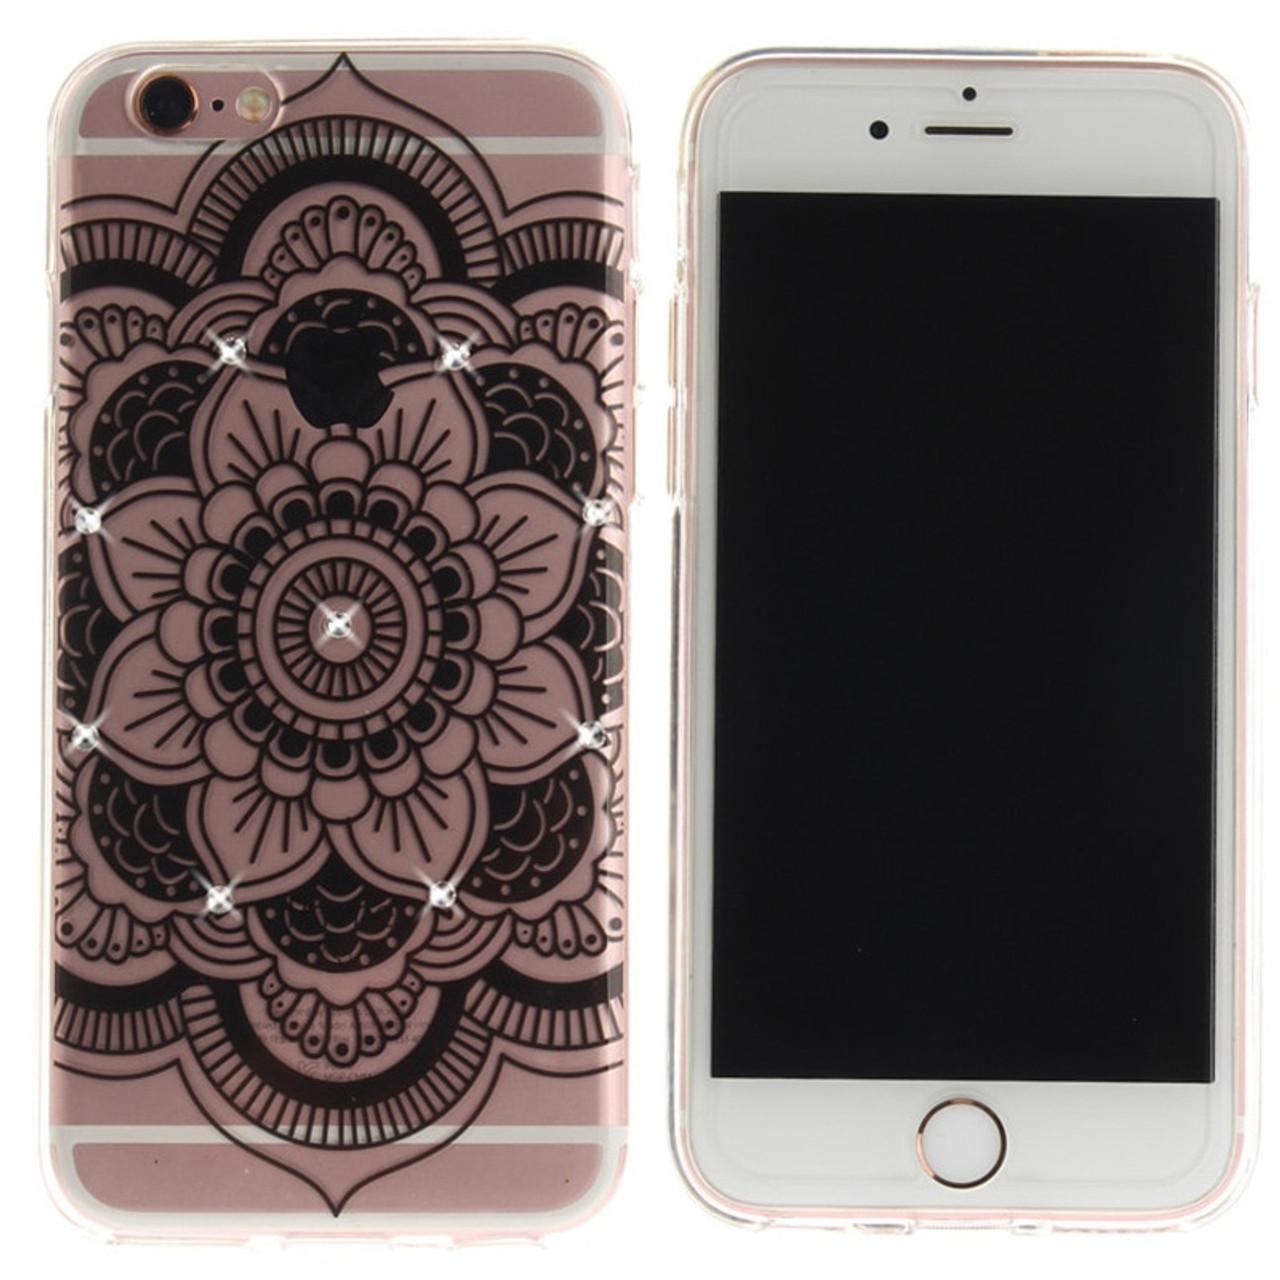 422cee76cc8 ... Rhinestone Coque Fundas For iphone 8 7 Plus 6 6s plus Girls Diamond  Floral Mandala Flower ...